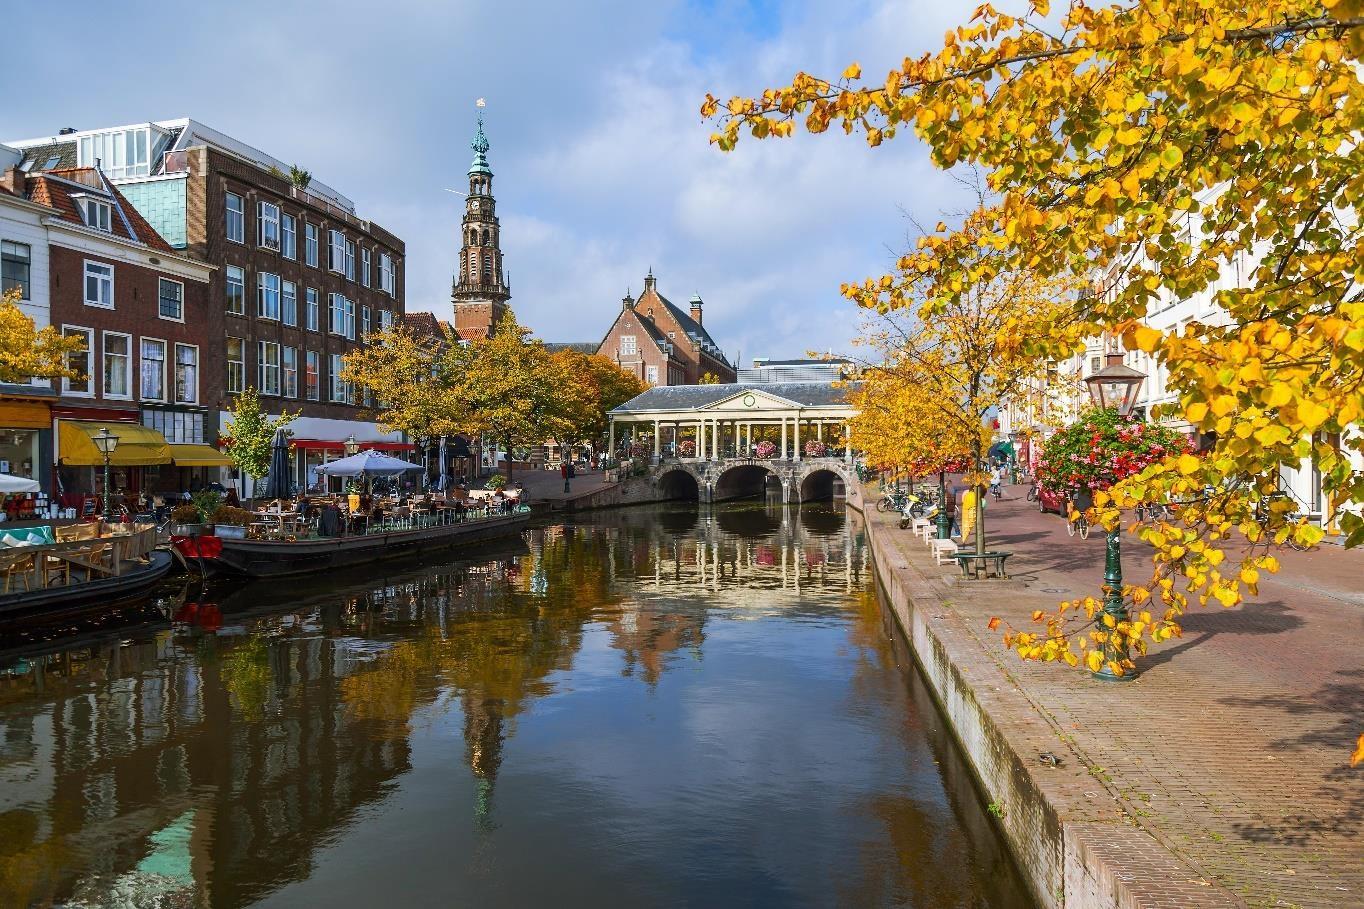 20180904 IEWP Leiden image